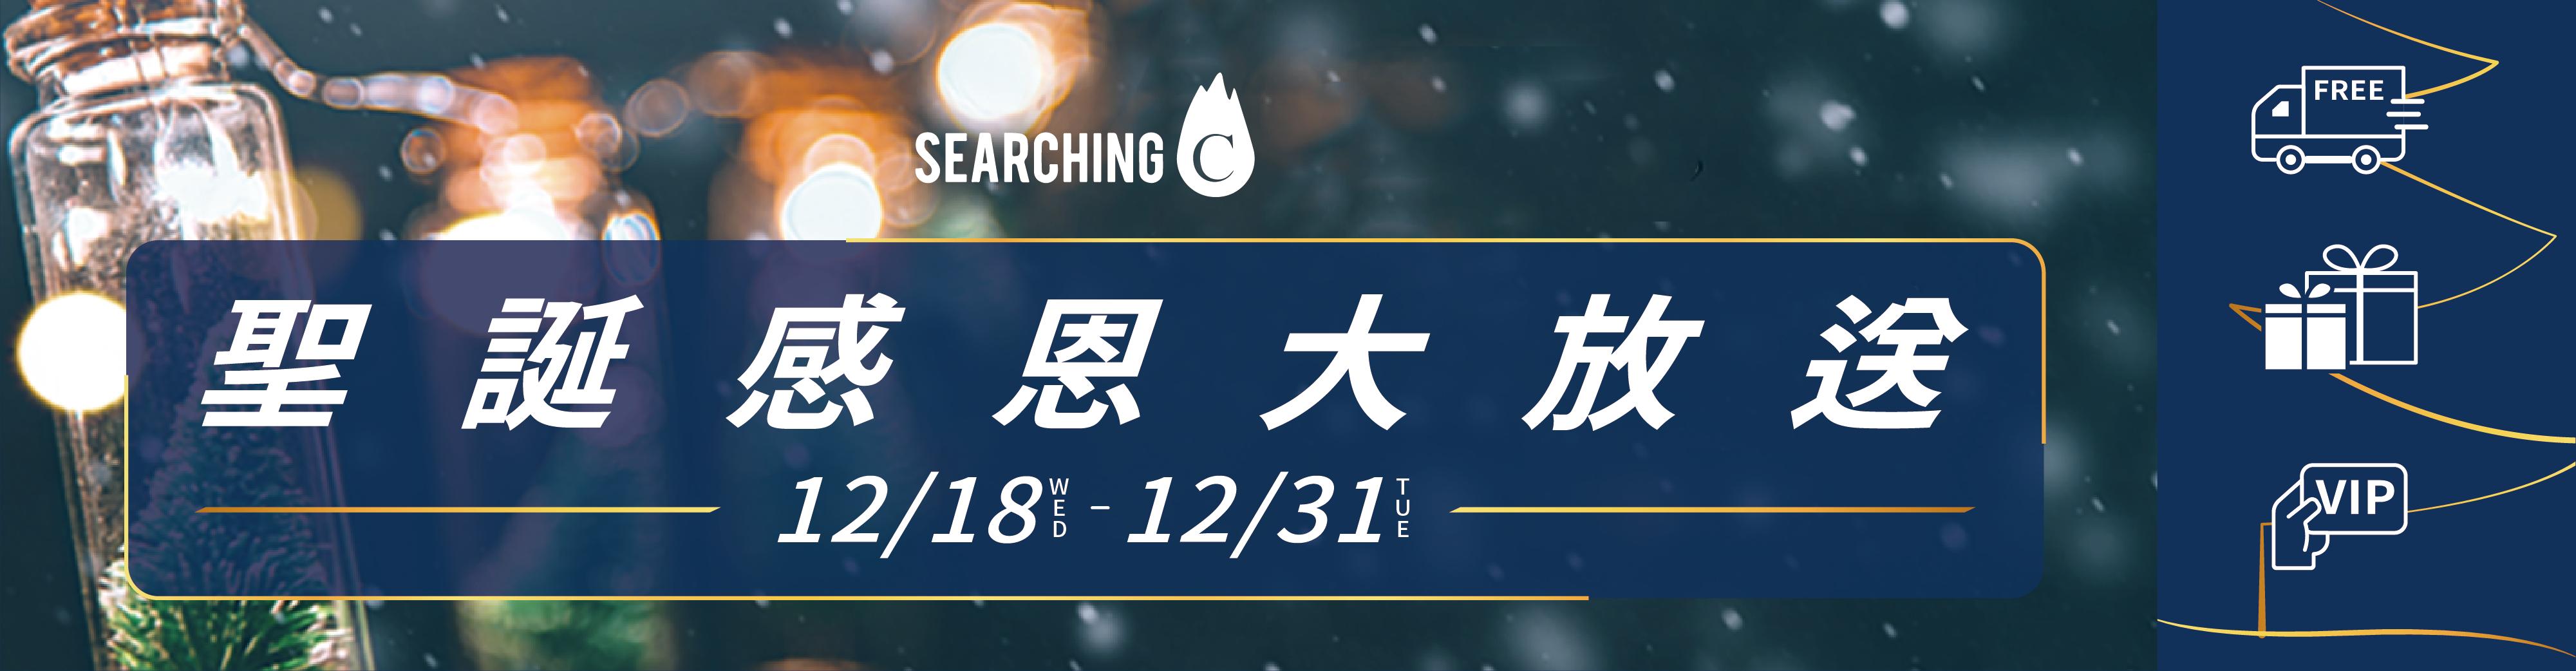 Searching Creation, searchingC, Searching C, 聖誕節, 禮物, 搶購, 現貨, 禮物推薦